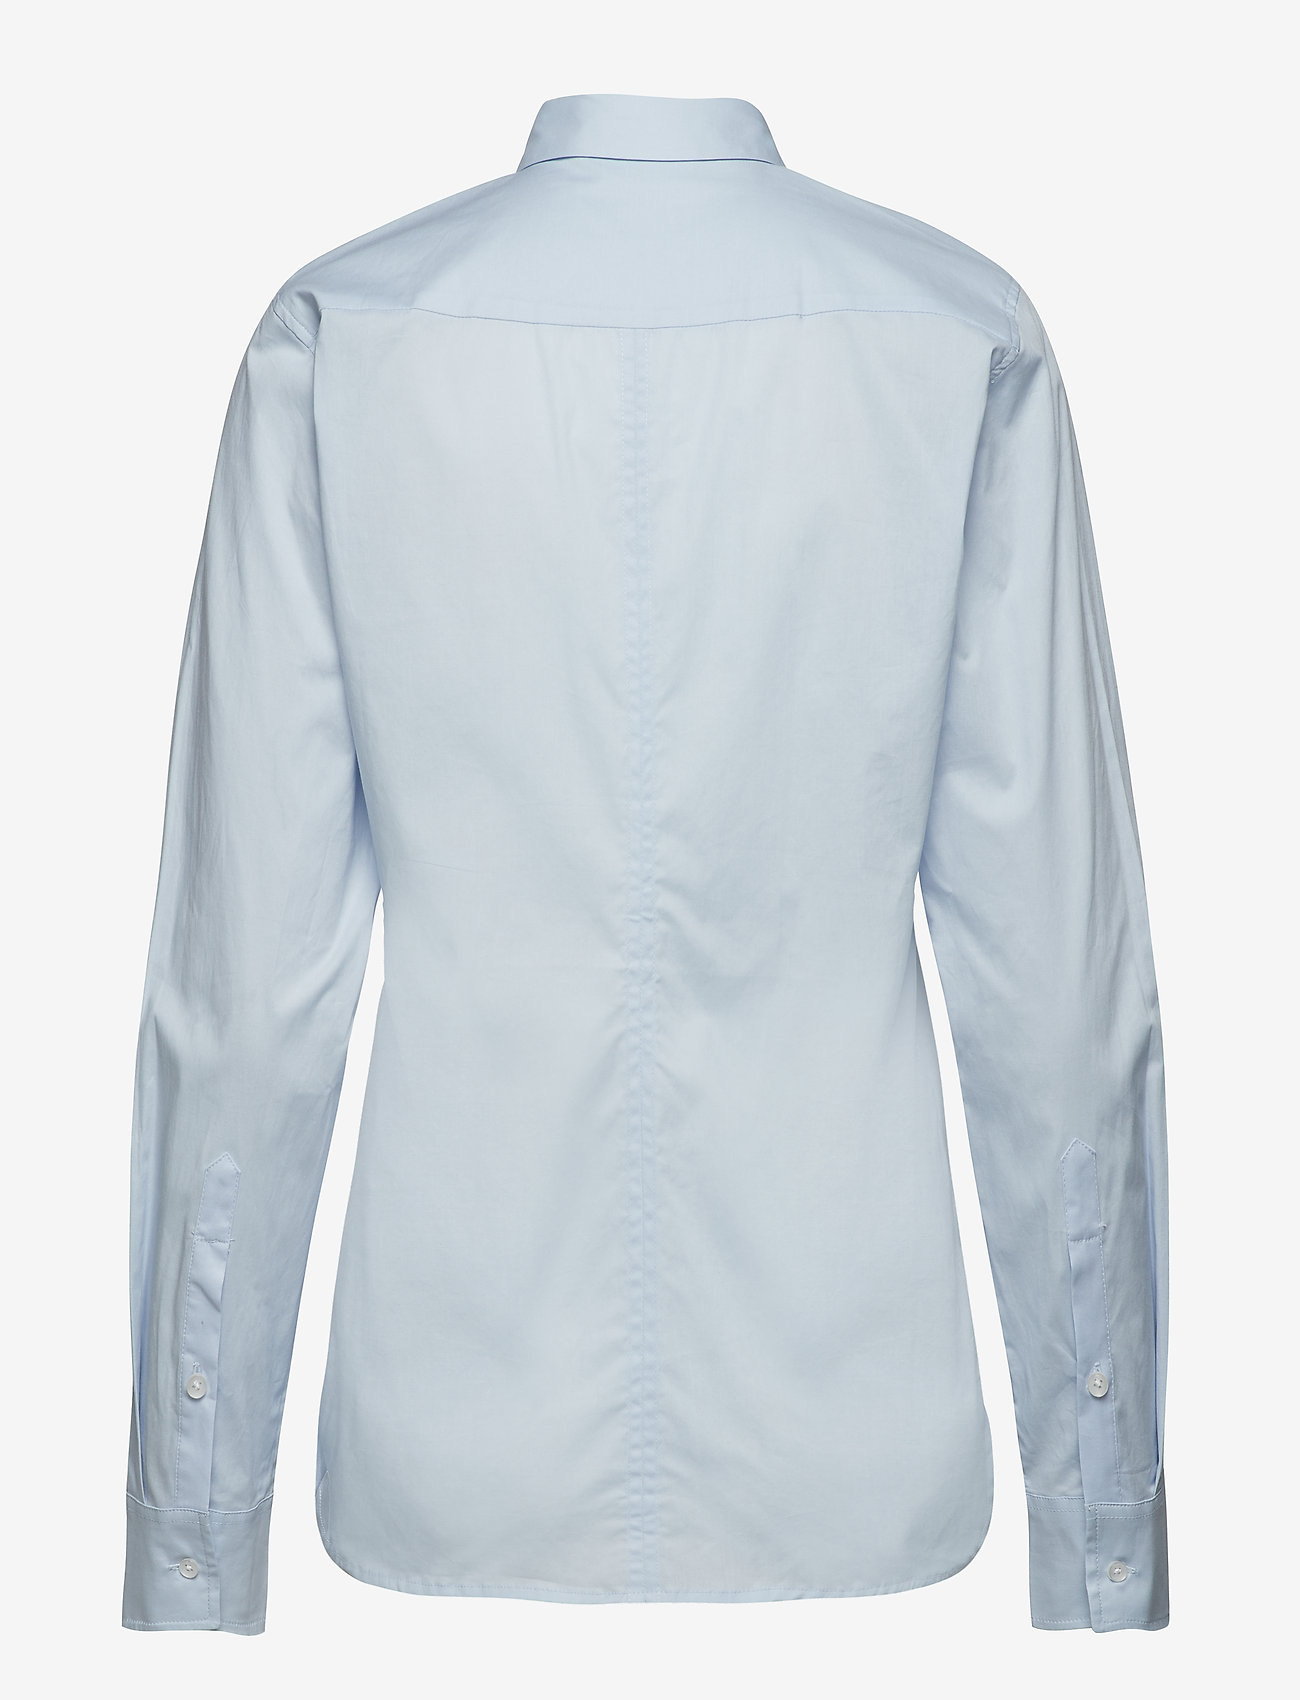 InWear Venus Shirt - Bluser & Skjorter PASTEL BLUE - Dameklær Spesialtilbud